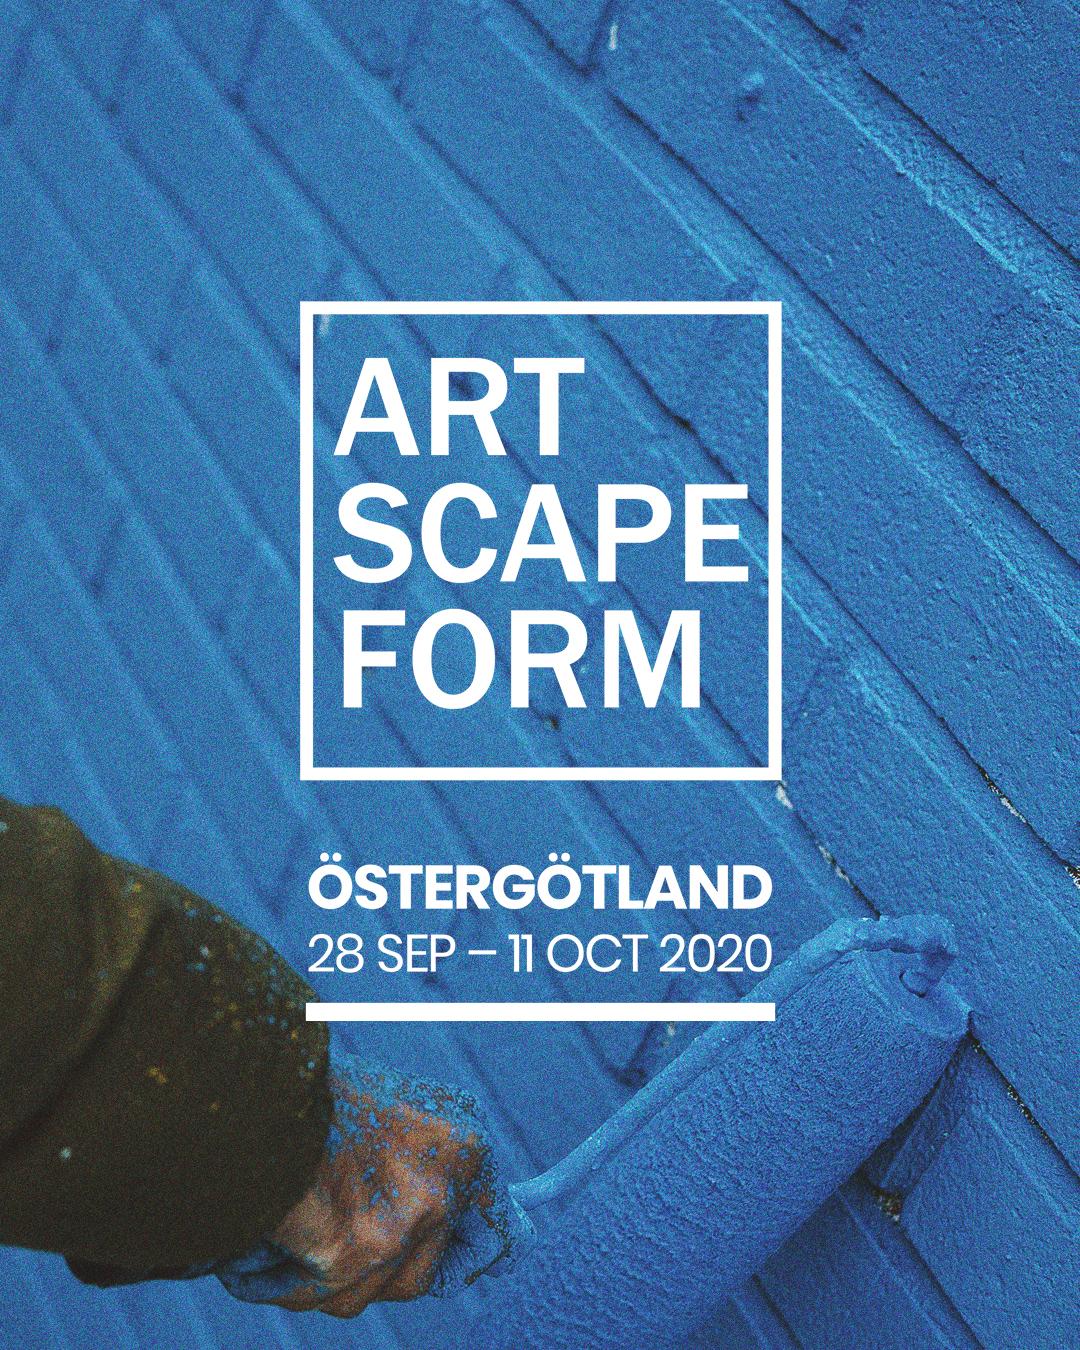 ARTSCAPE FORM – Östergötland 2020